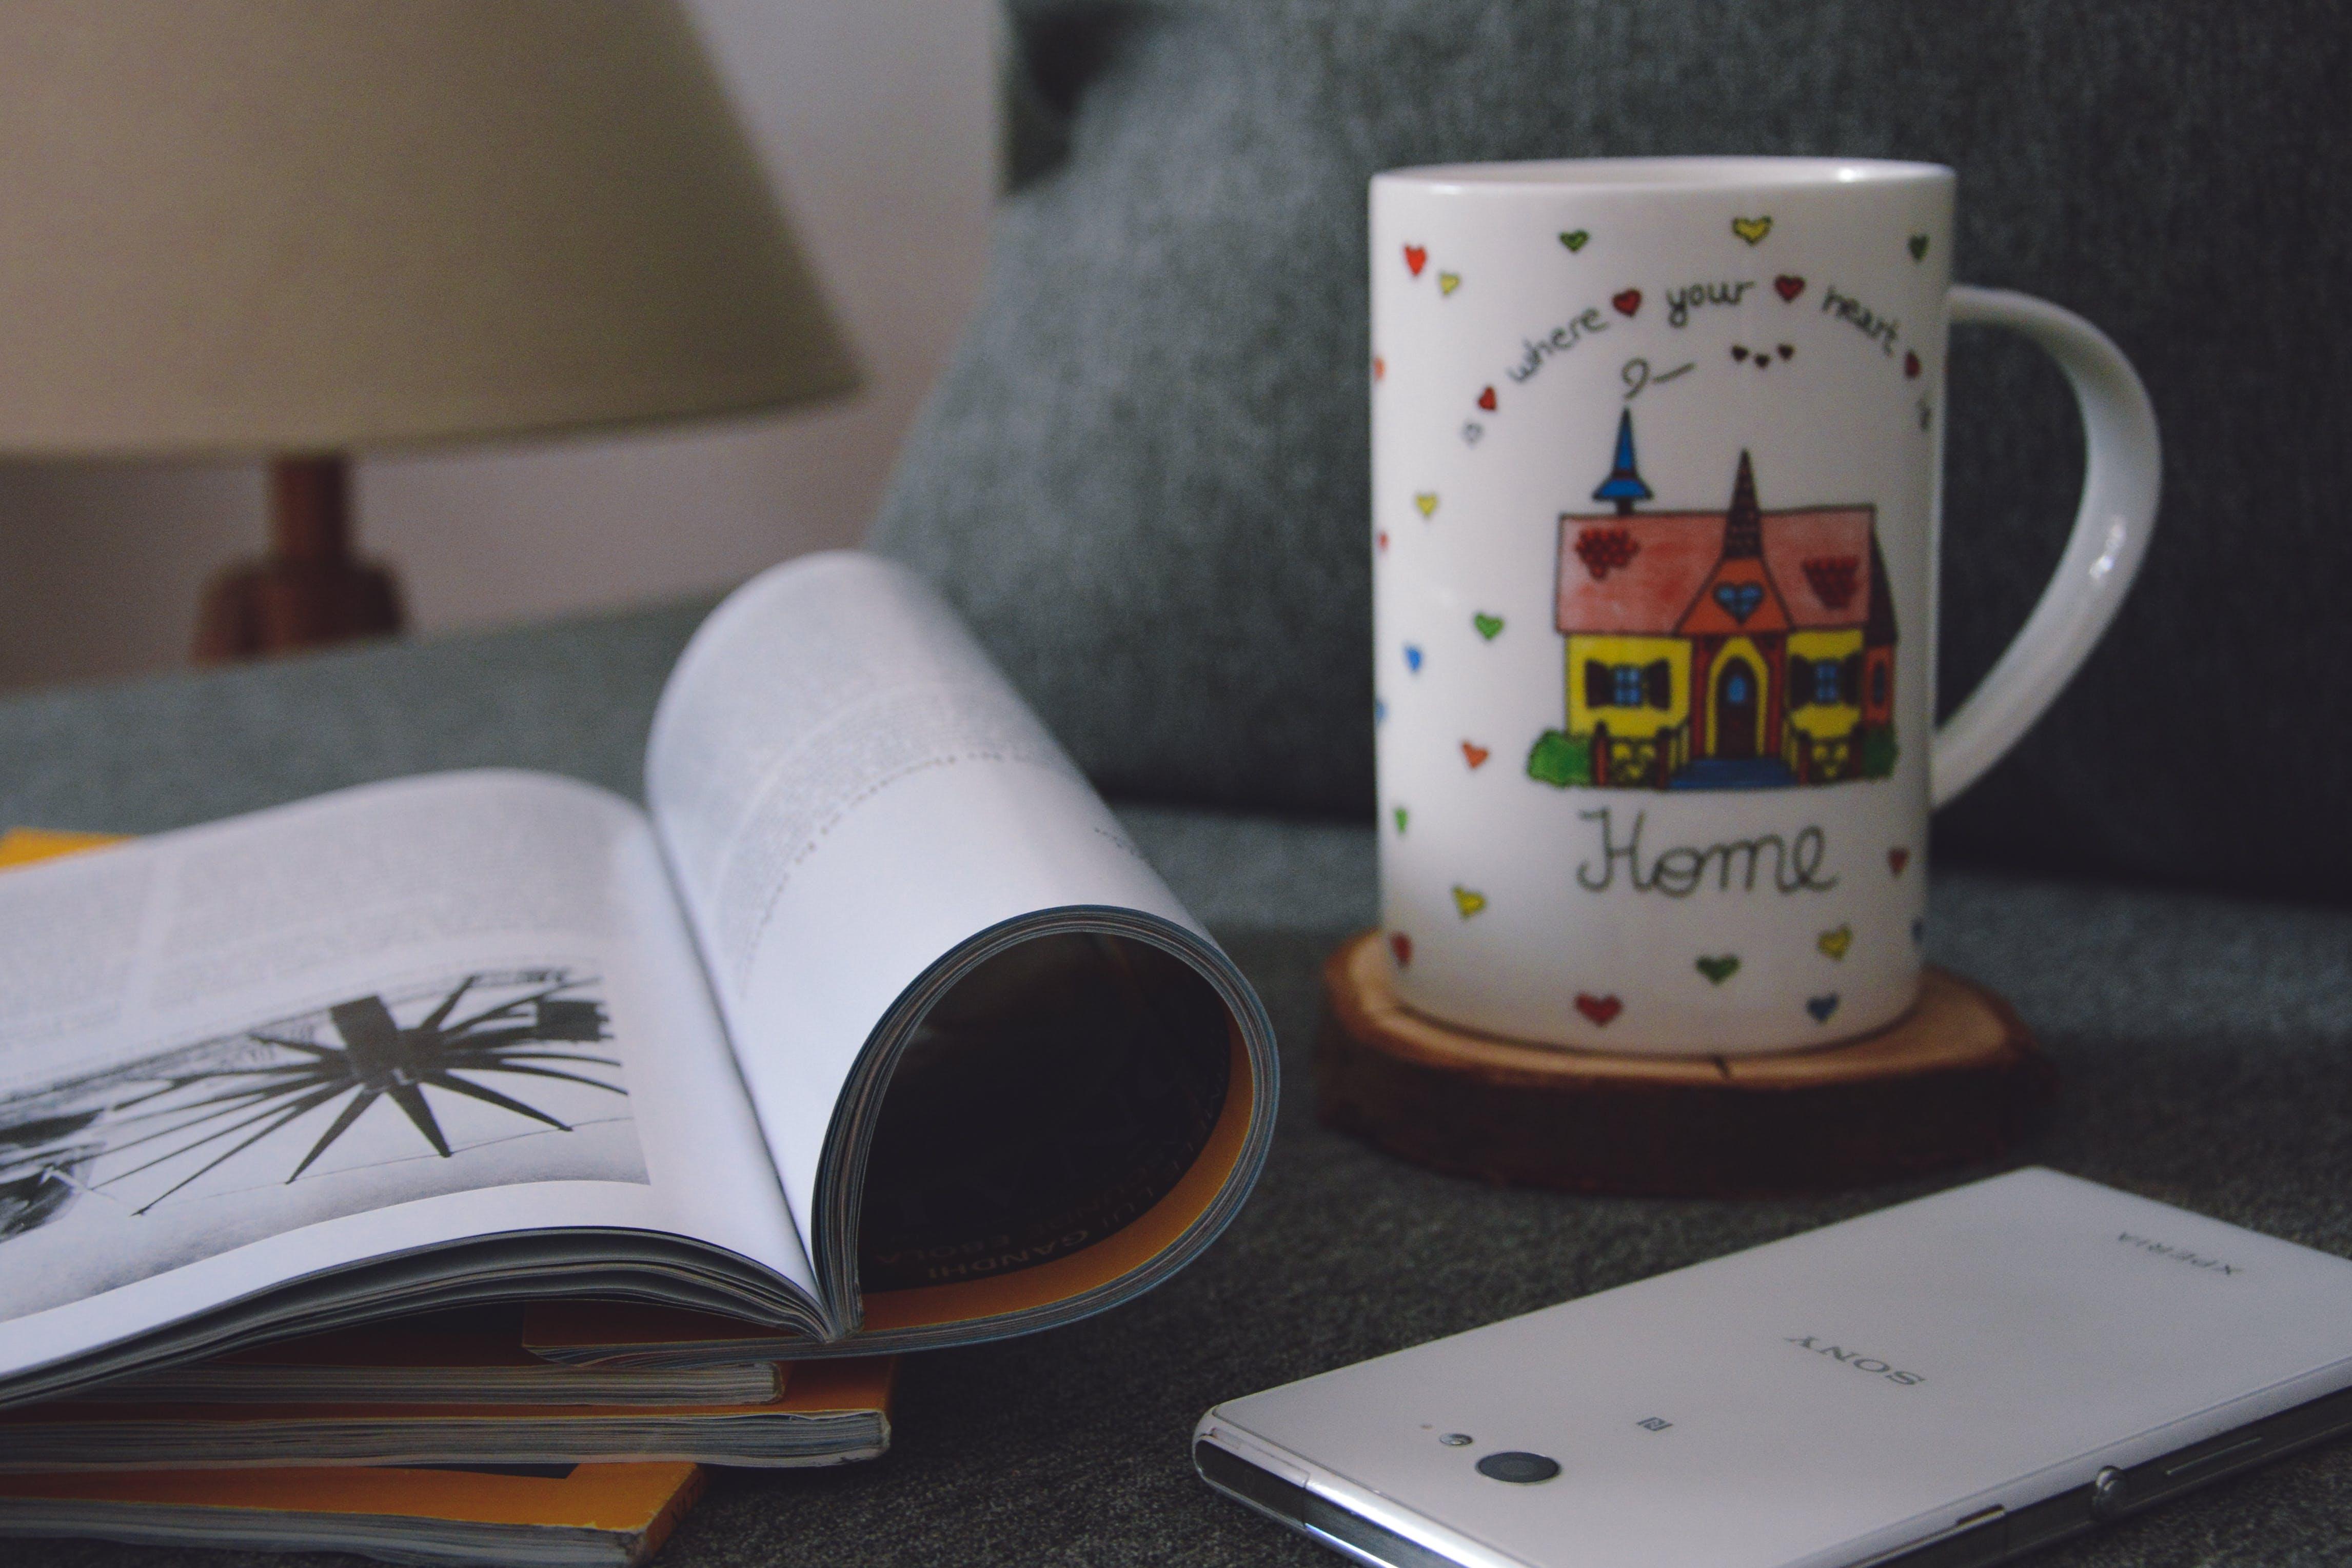 Free stock photo of caffee, home, magazine, mug